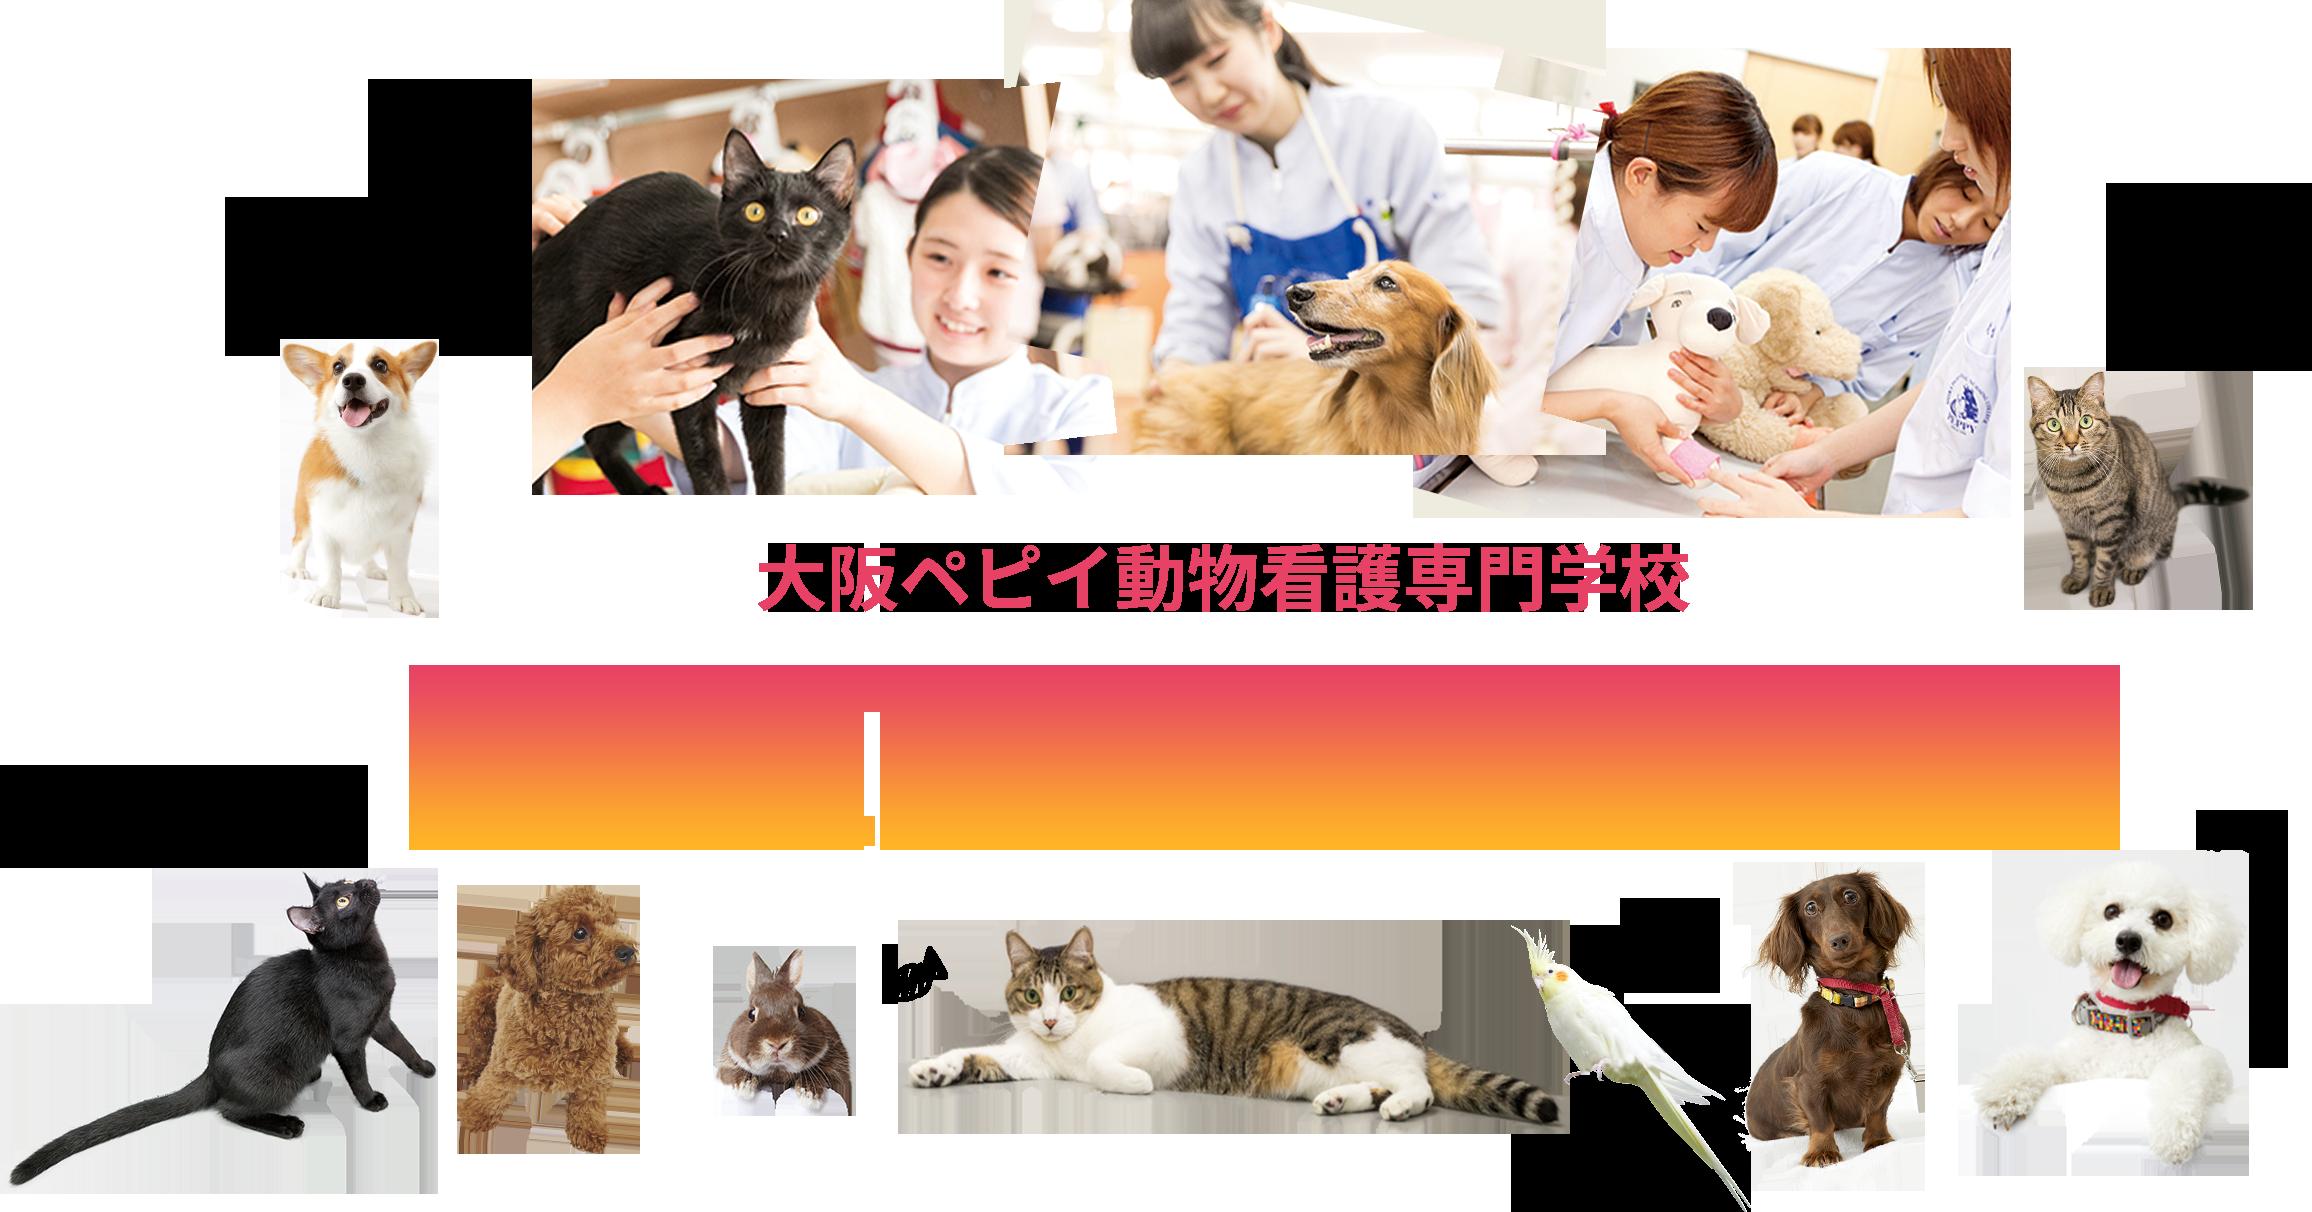 大阪ペピイ動物看護専門学校 OPEN CAMPUS